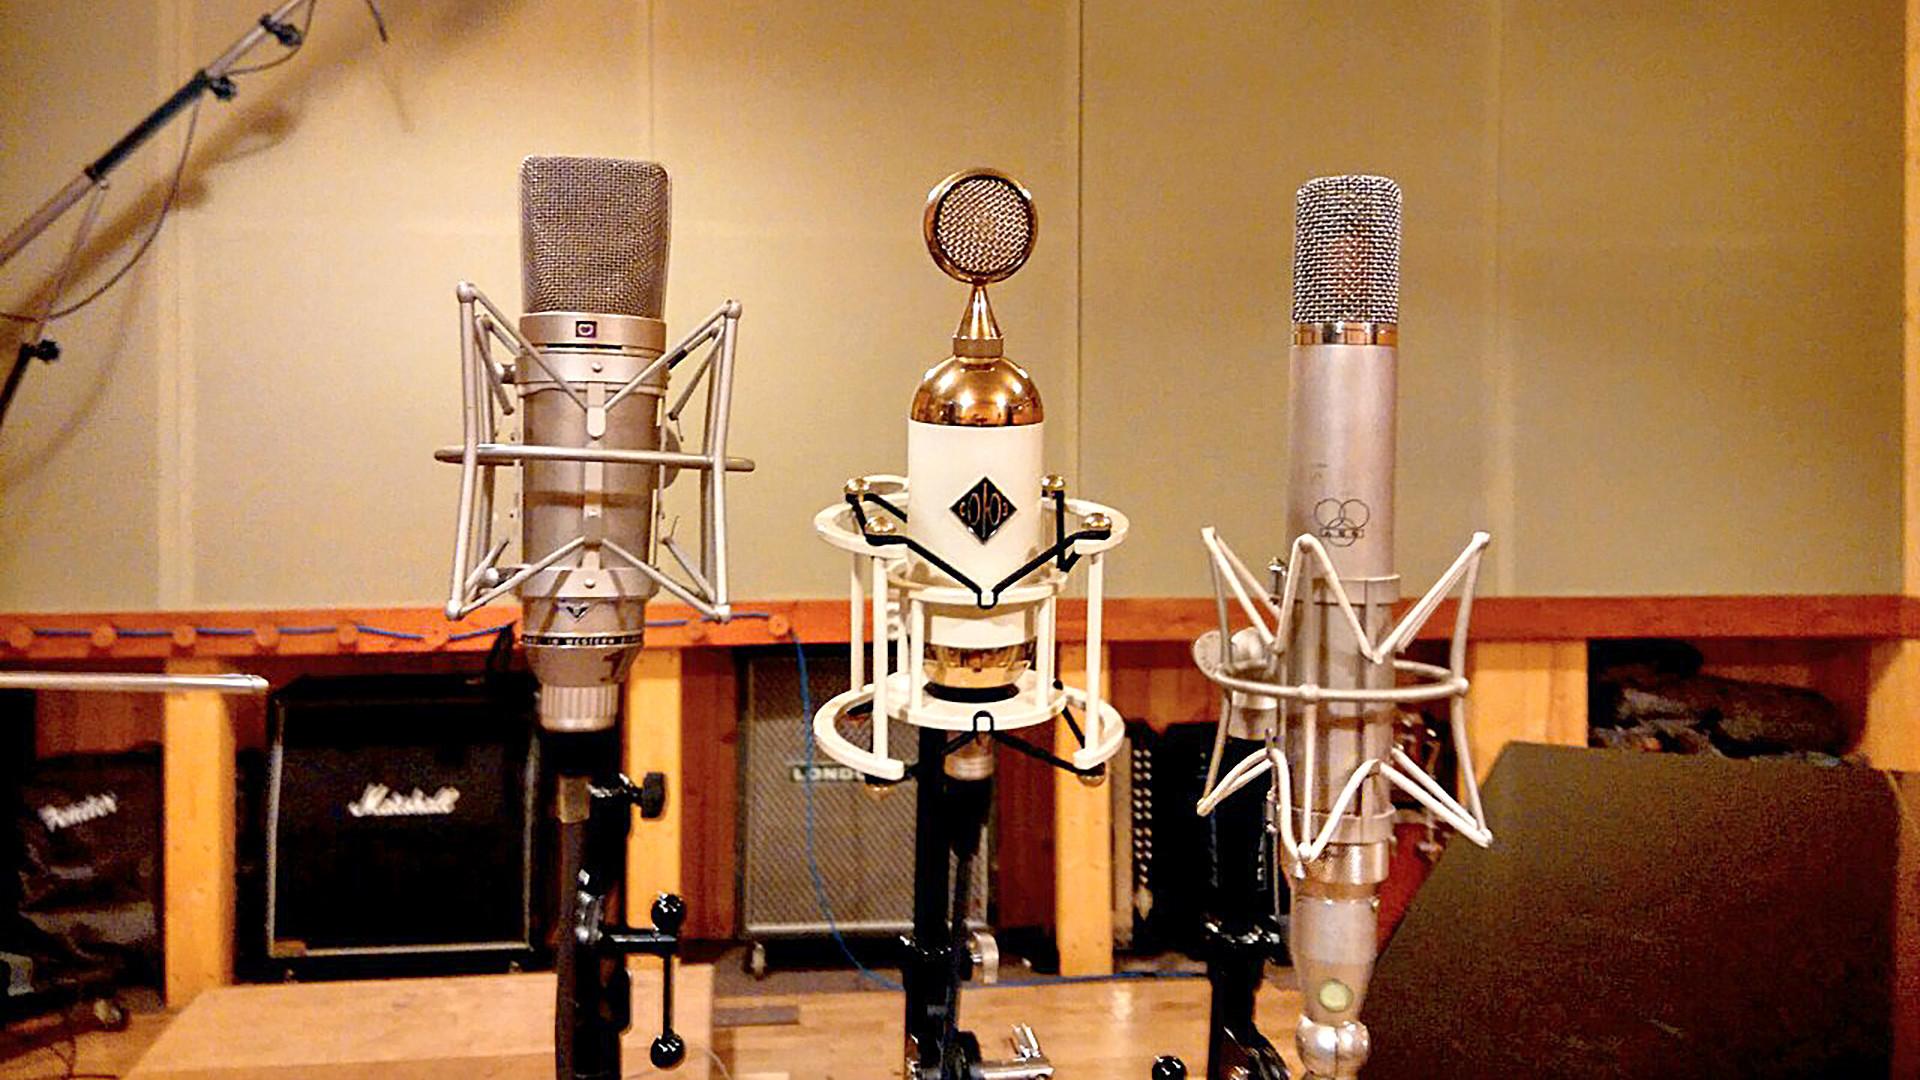 The company's customers include Grammy award-winning producers like Nigel Godrich, Justin Meldal-Johnsen, and Ryan Hewitt.